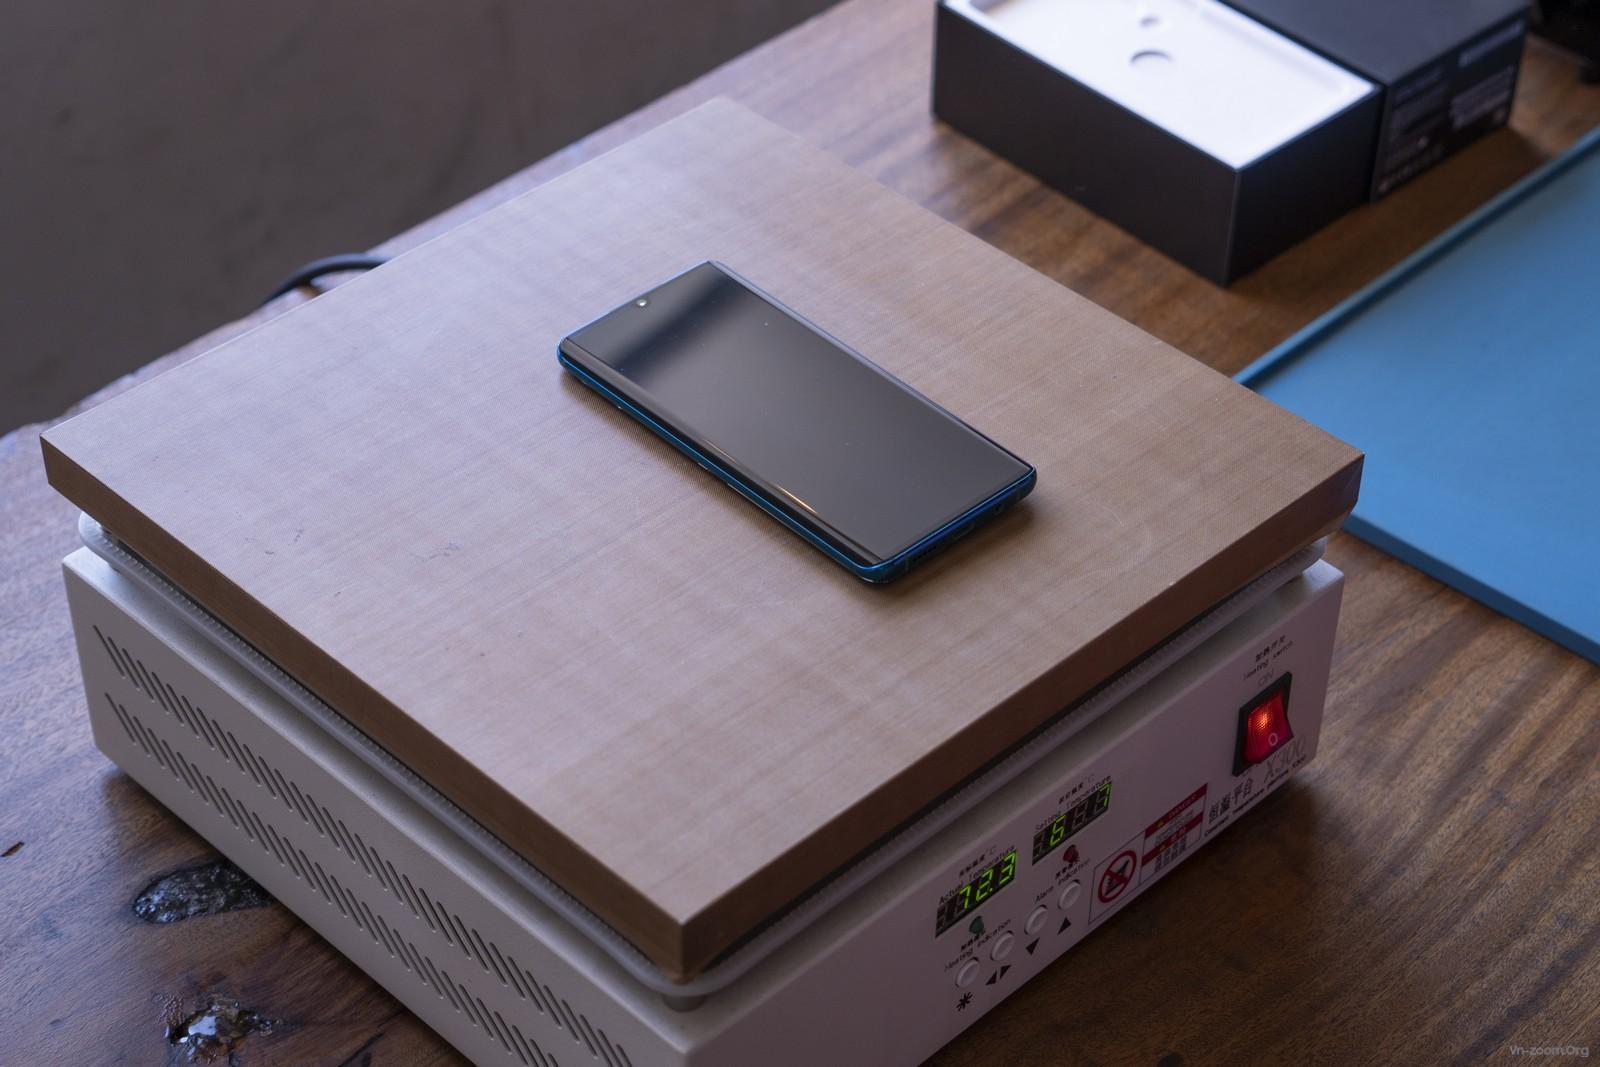 191217-Xiaomi-Mi-Note-10-Teardown-001.jpg